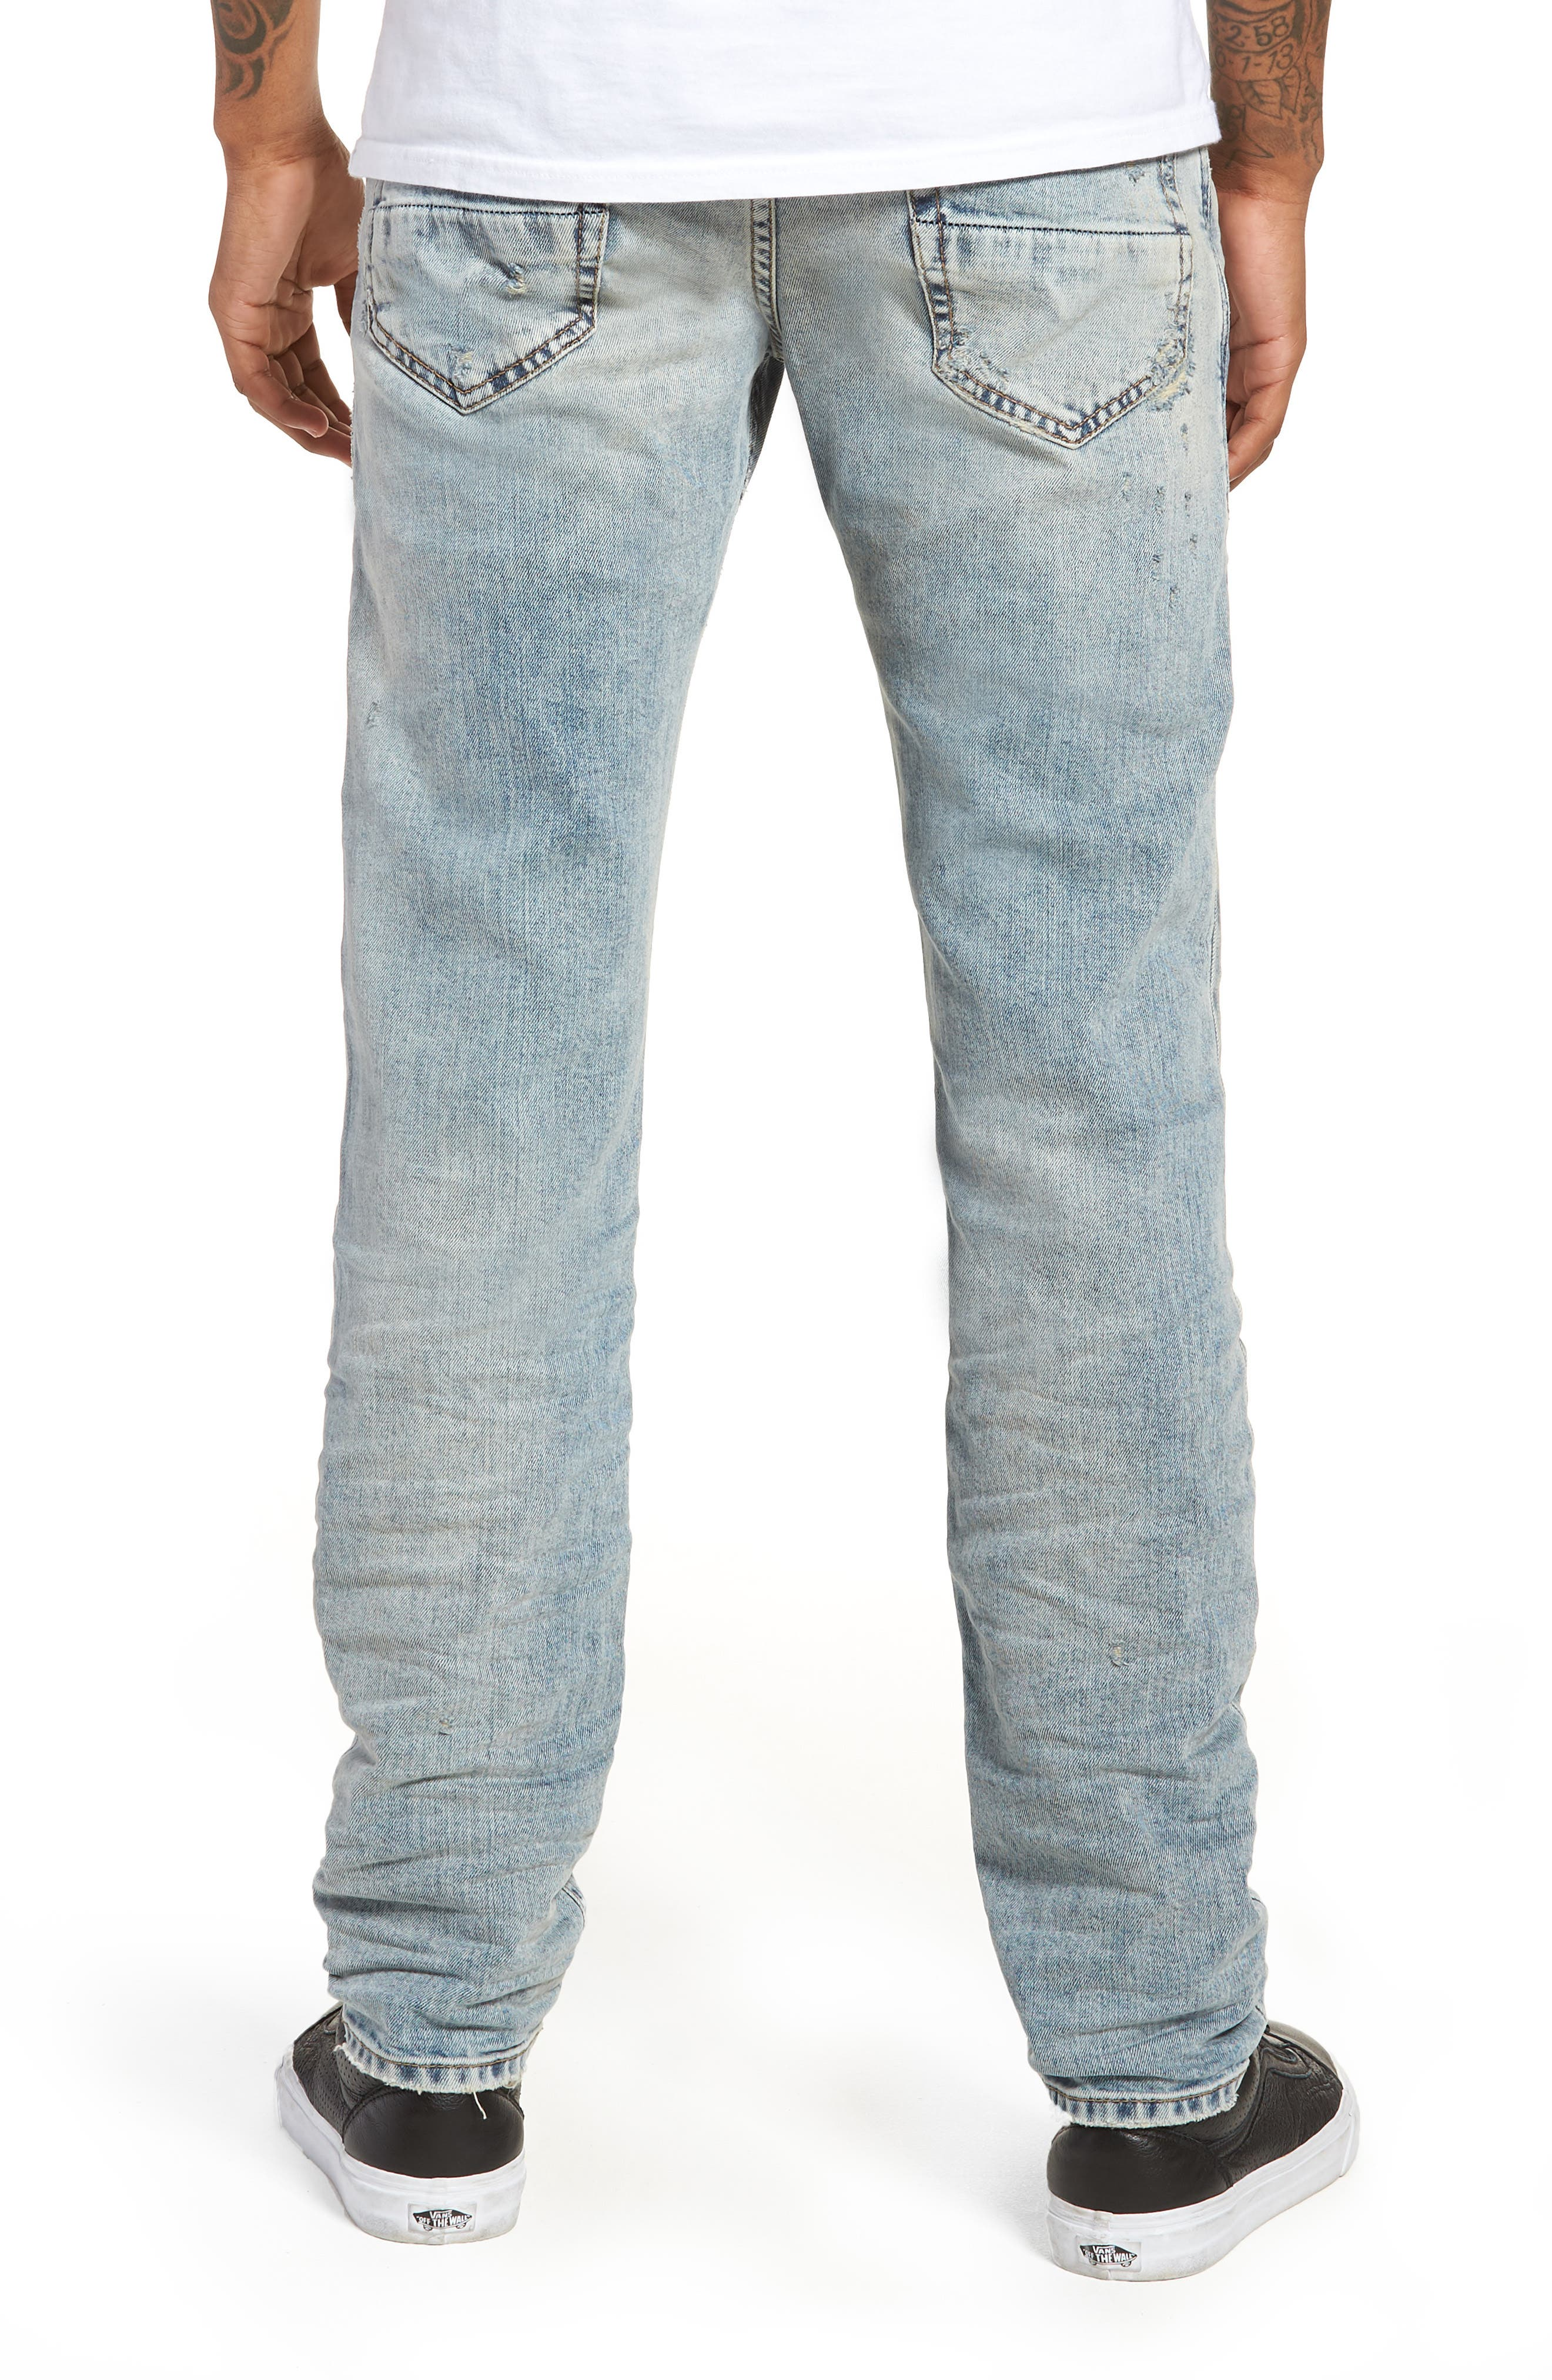 Thommer Skinny Fit Jeans,                             Alternate thumbnail 2, color,                             084Rf